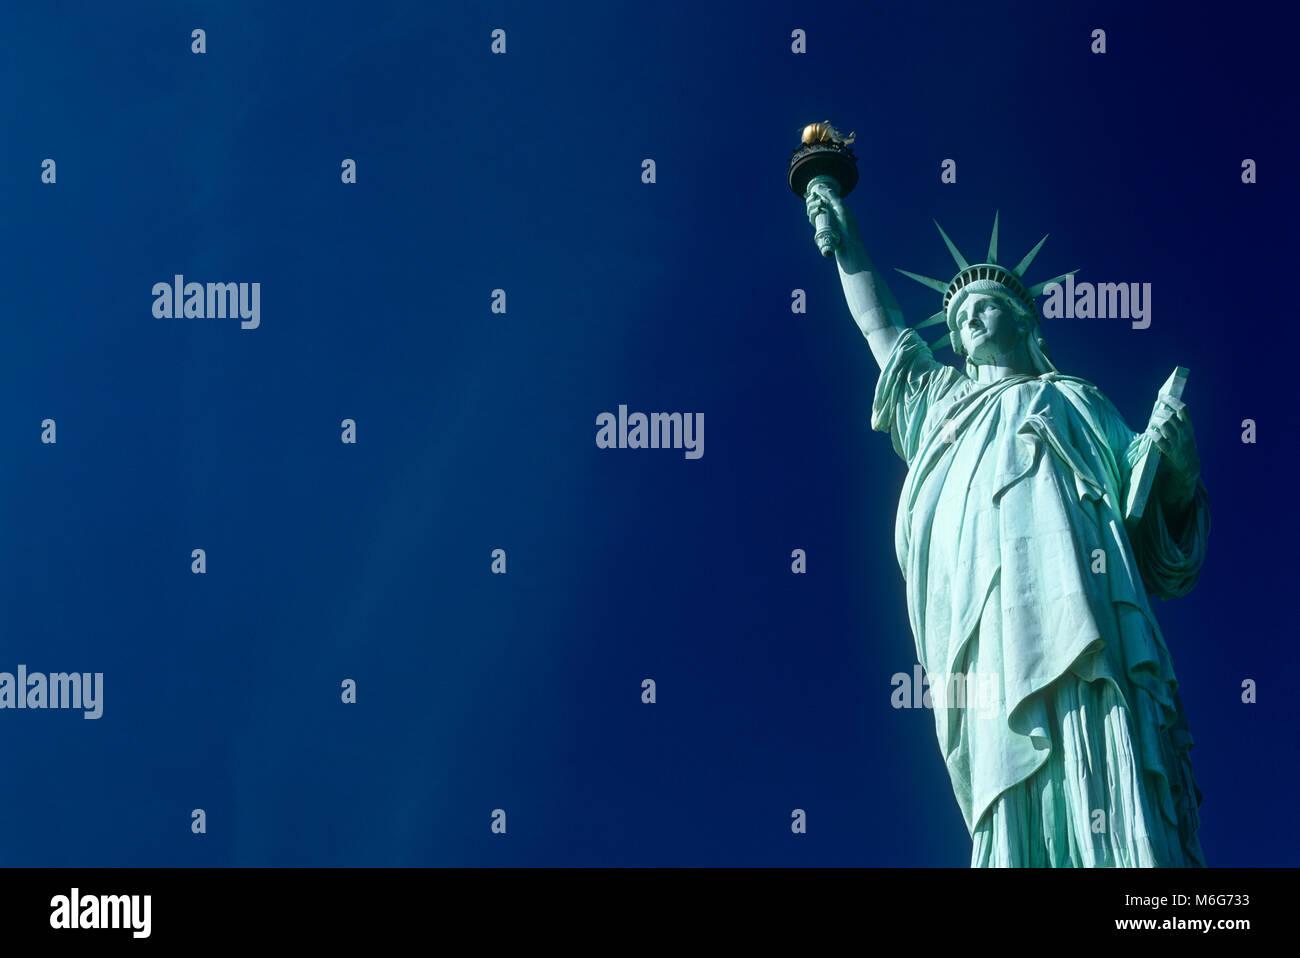 Statue of Liberty, Liberty Island, New York, USA - Stock Image